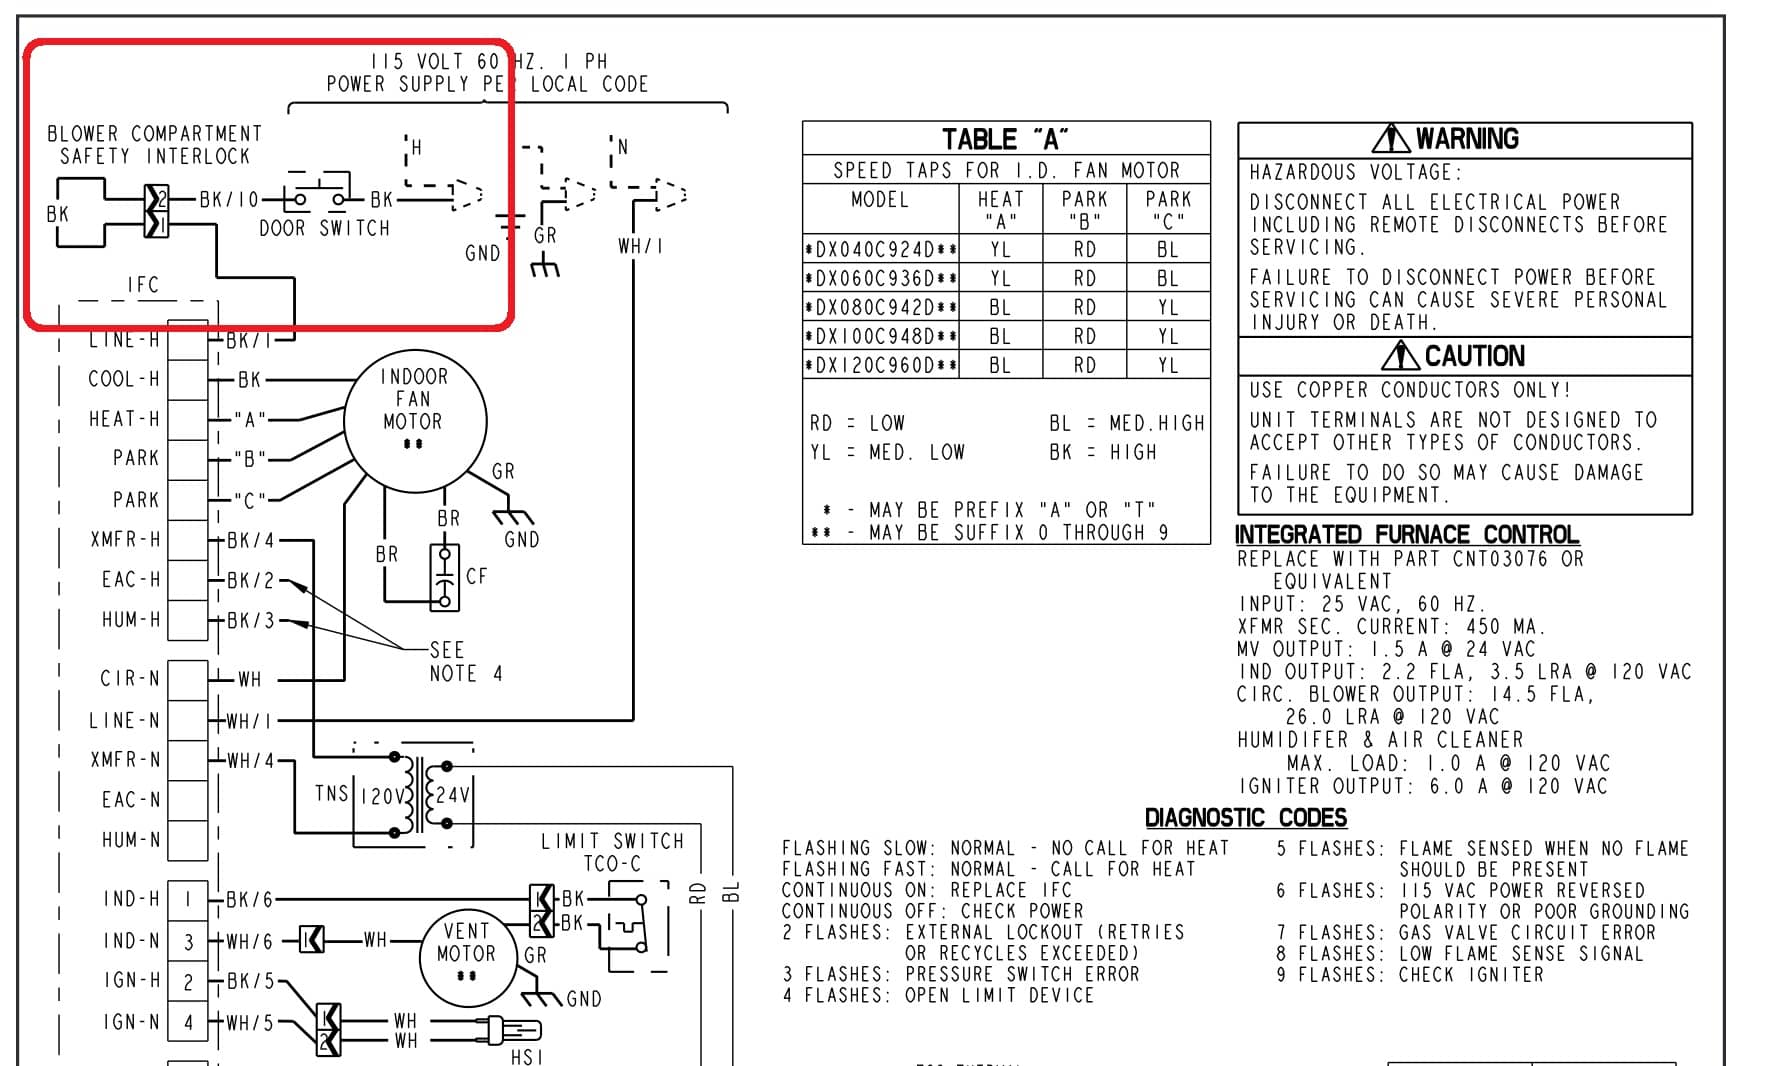 trane wiring diagrams suzuki cultus efi diagram xl80 parts heat pump schematic